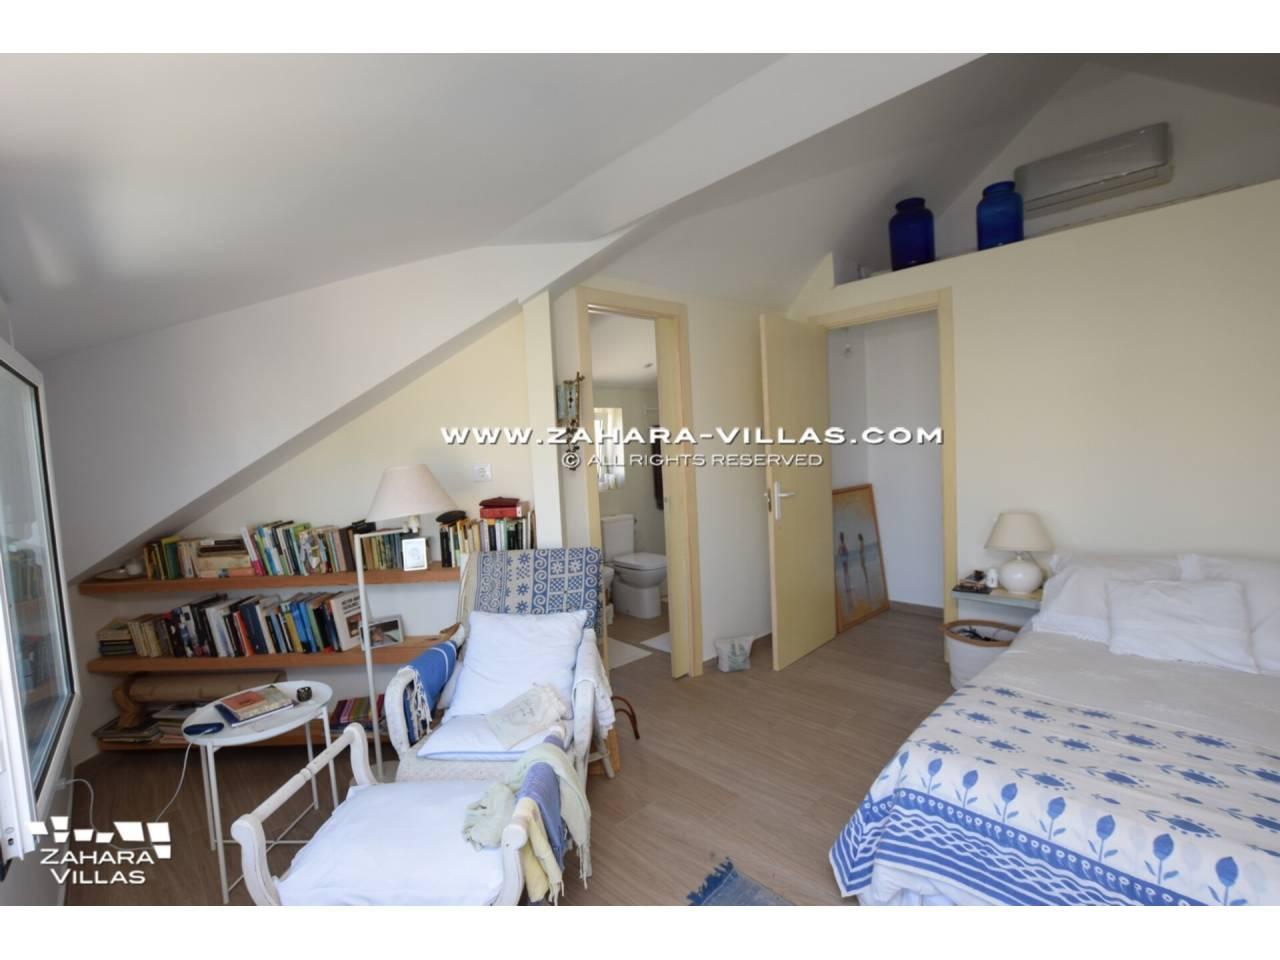 Imagen 38 de House for sale close to the beach, with sea views in Zahara de los Atunes